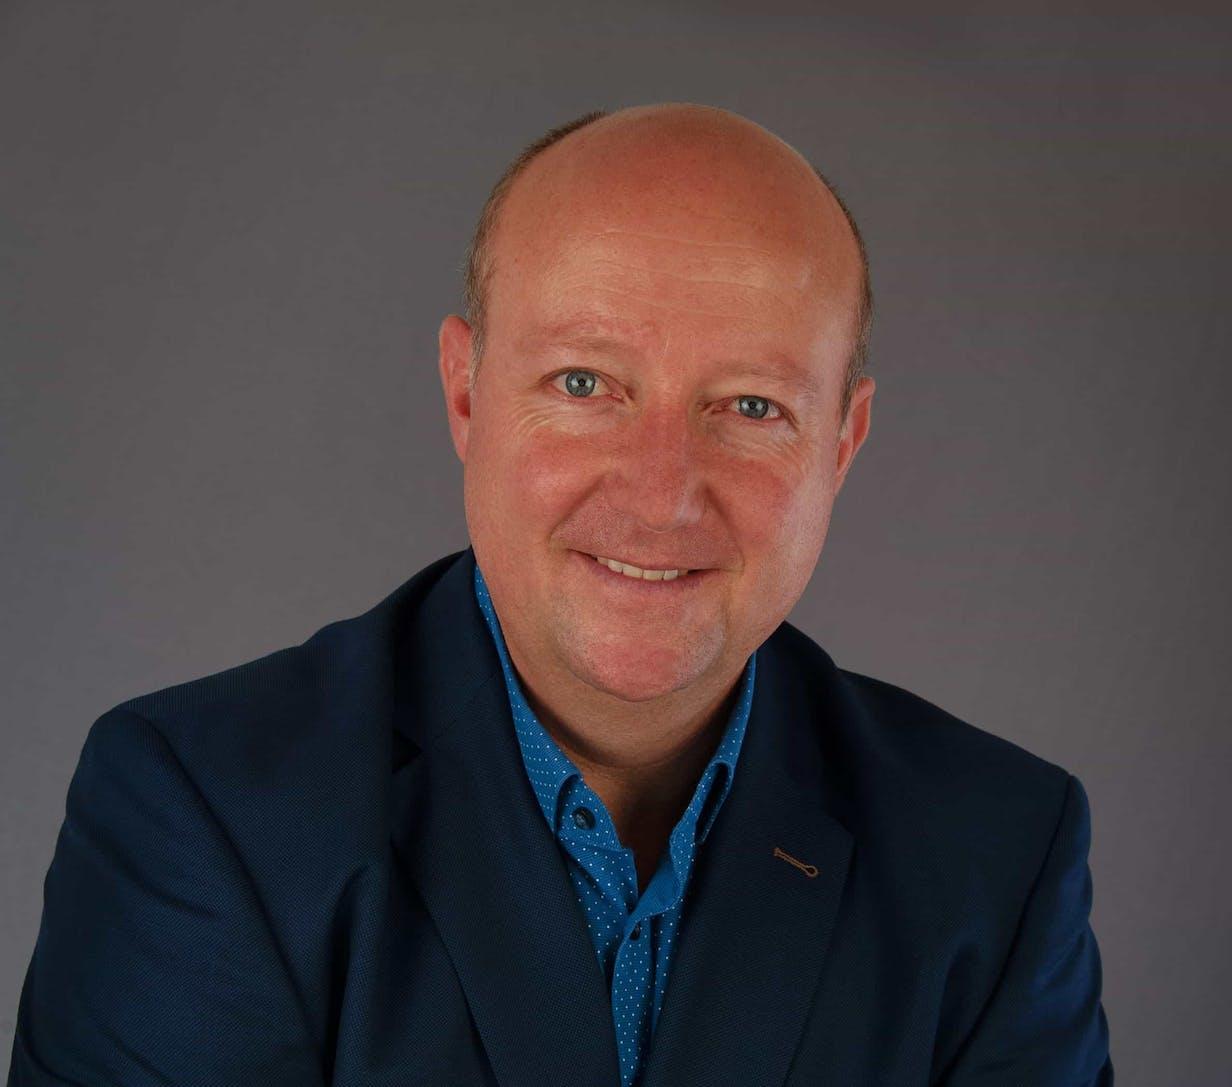 Sean Dickinson - Unicard CEO